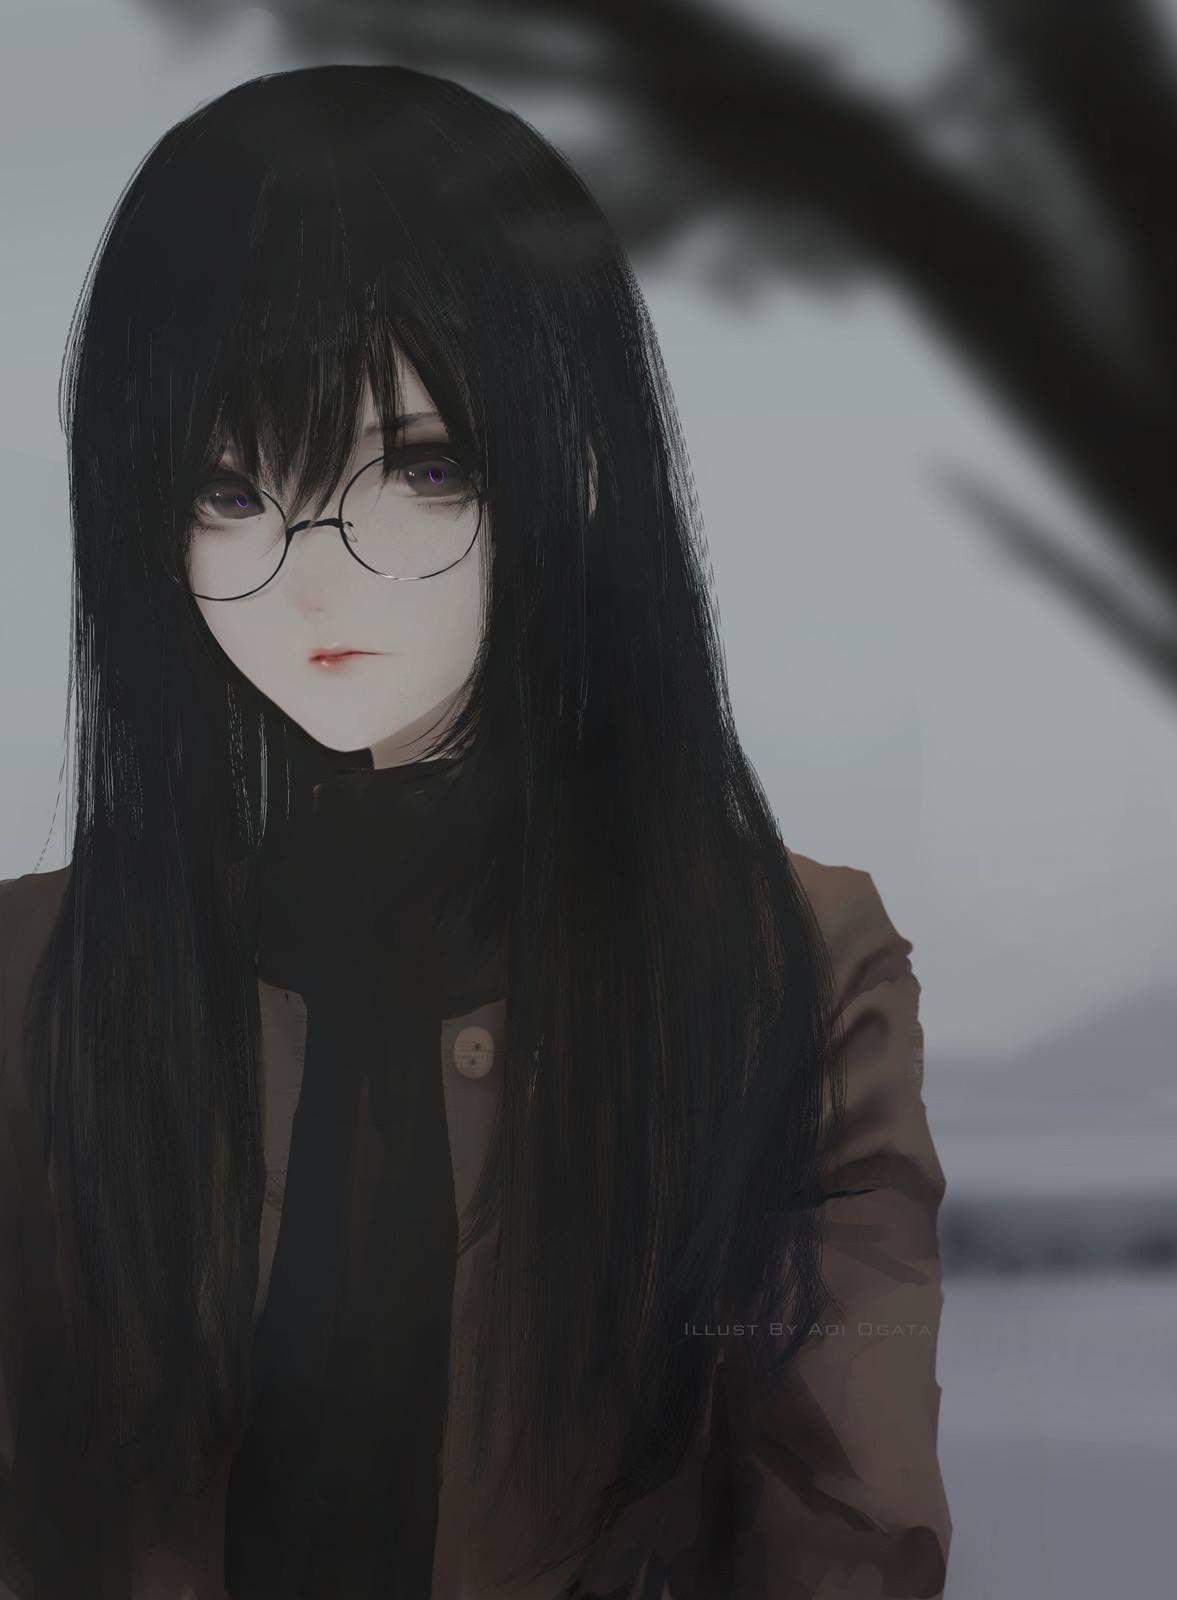 Anime Girl With Long Black Hair And Bangs : anime, black, bangs, Anime, Black, Bangs, Drawing, Ideas